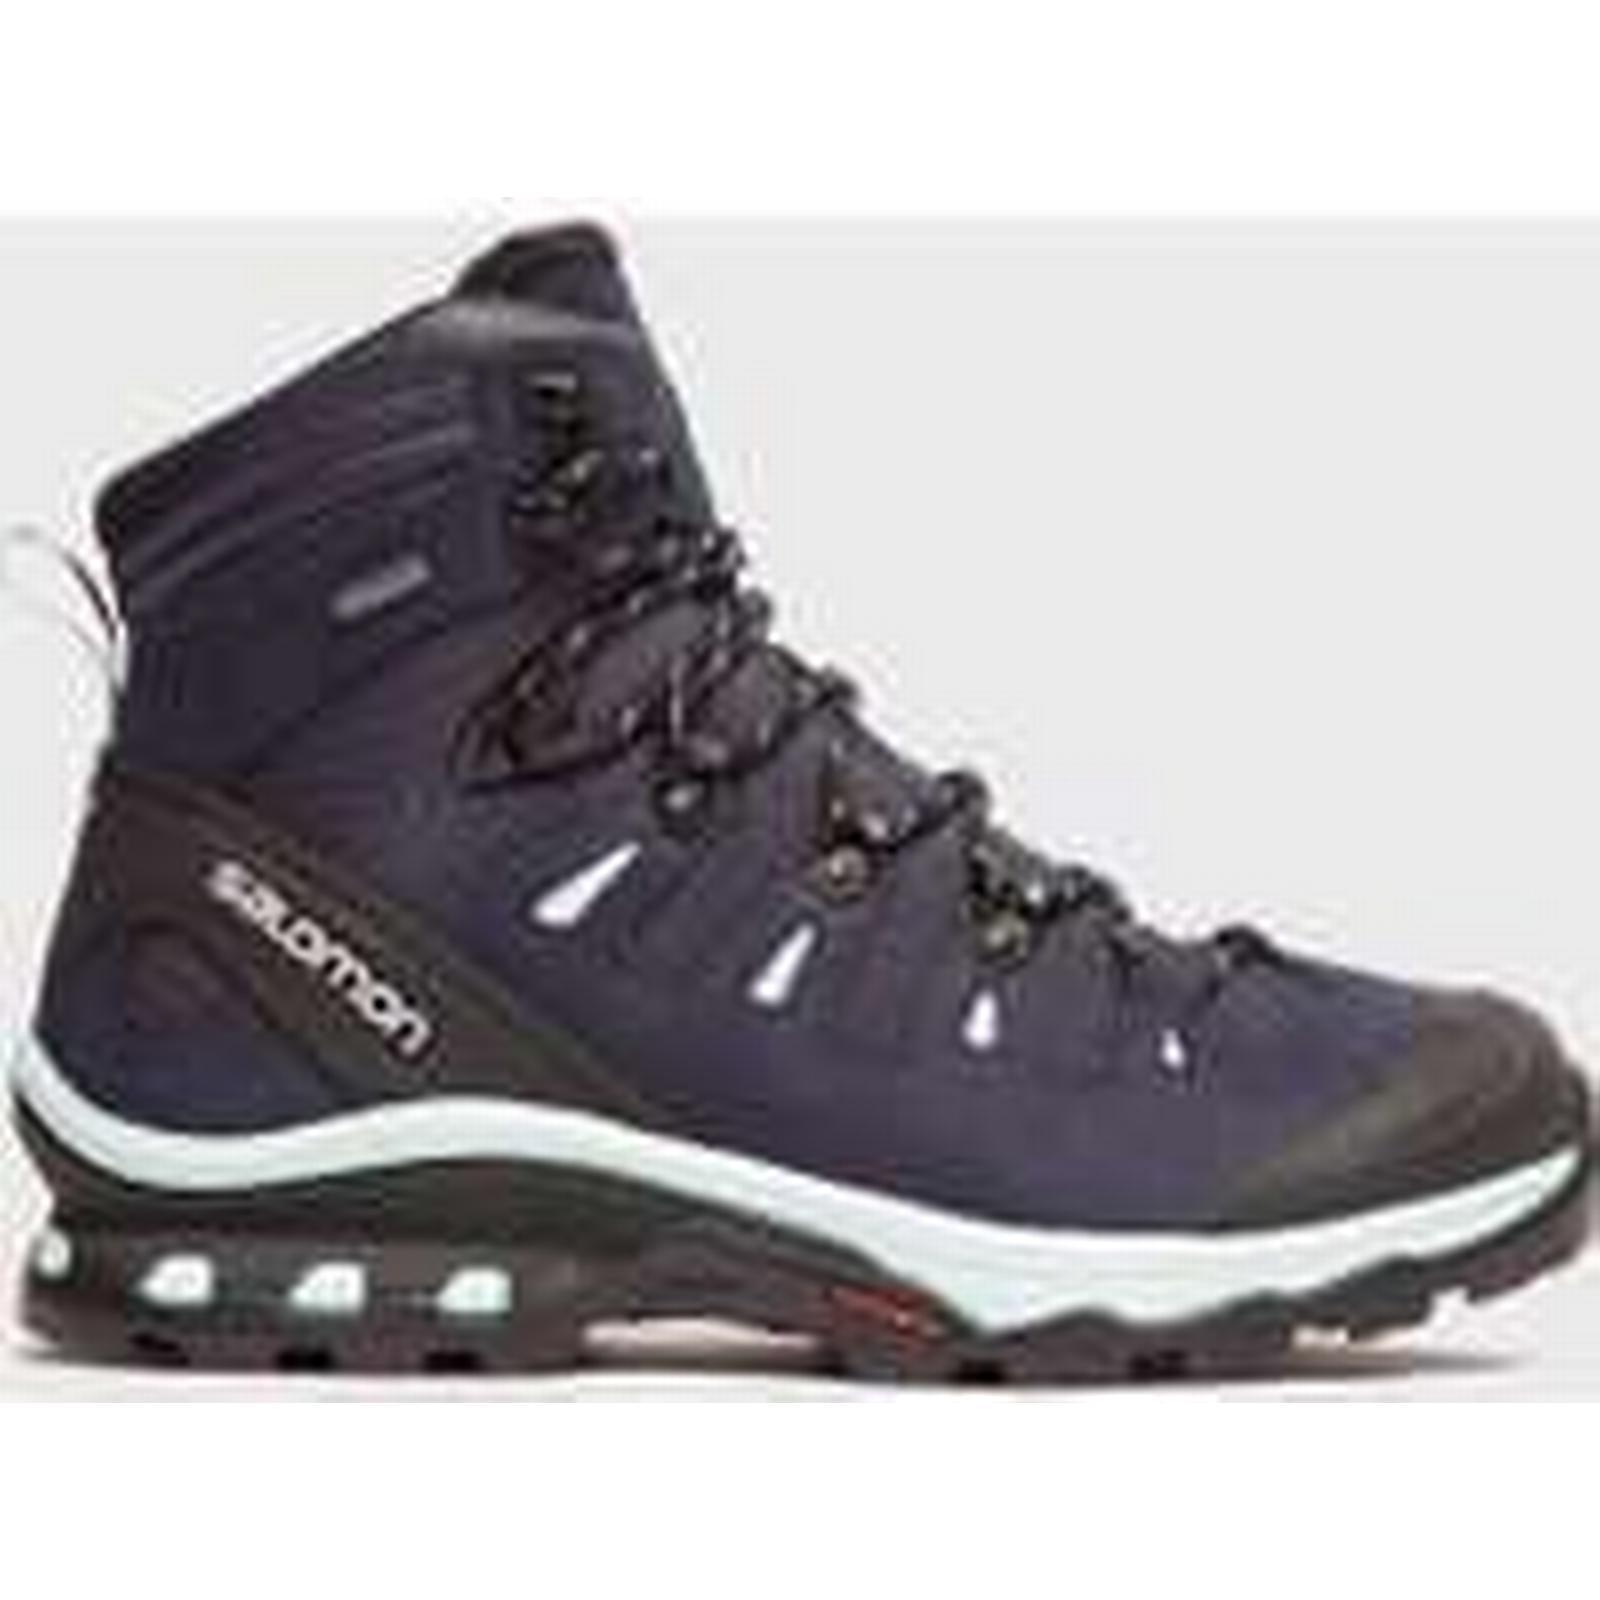 Salomon Women's Hiking Quest 3 4D GORE-TEX Hiking Women's Boot - Grey, Grey 25c398